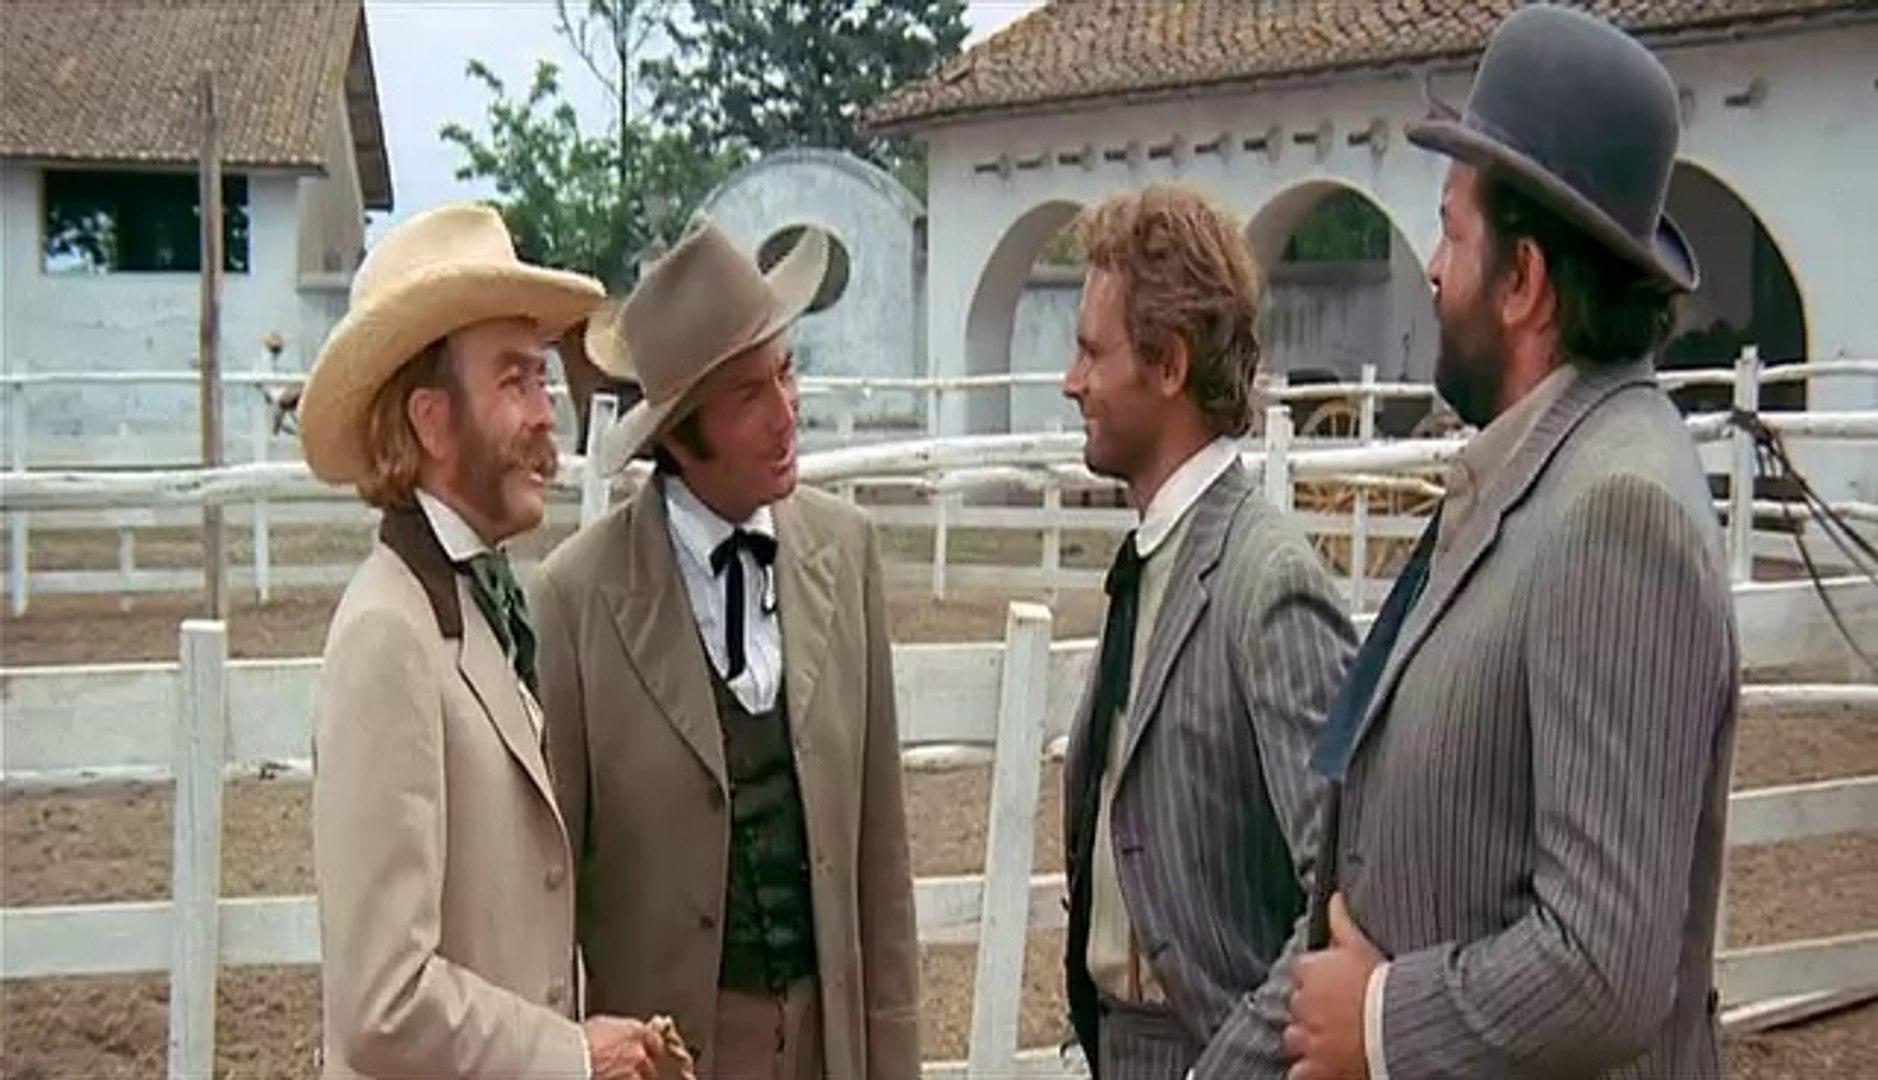 trinity western movies full length